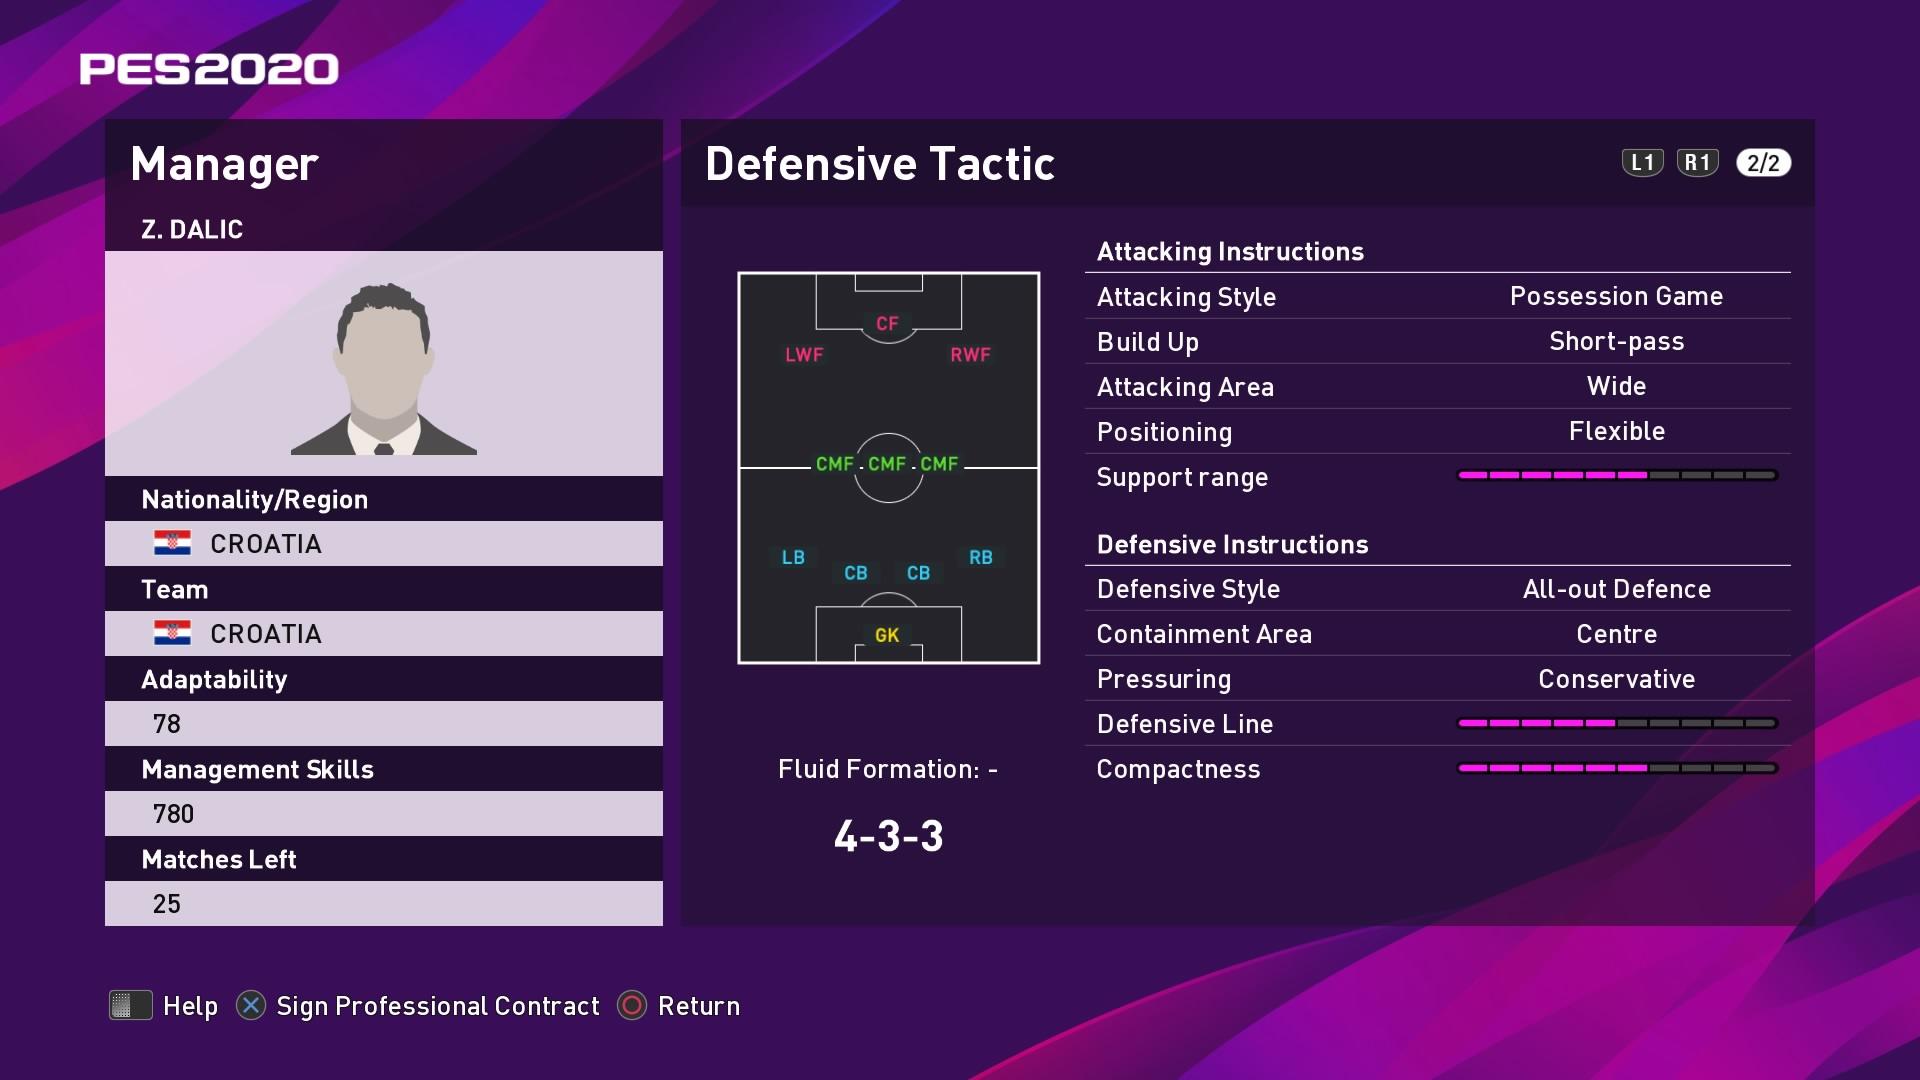 Z. Dalic (Zlatko Dalić) Defensive Tactic in PES 2020 myClub